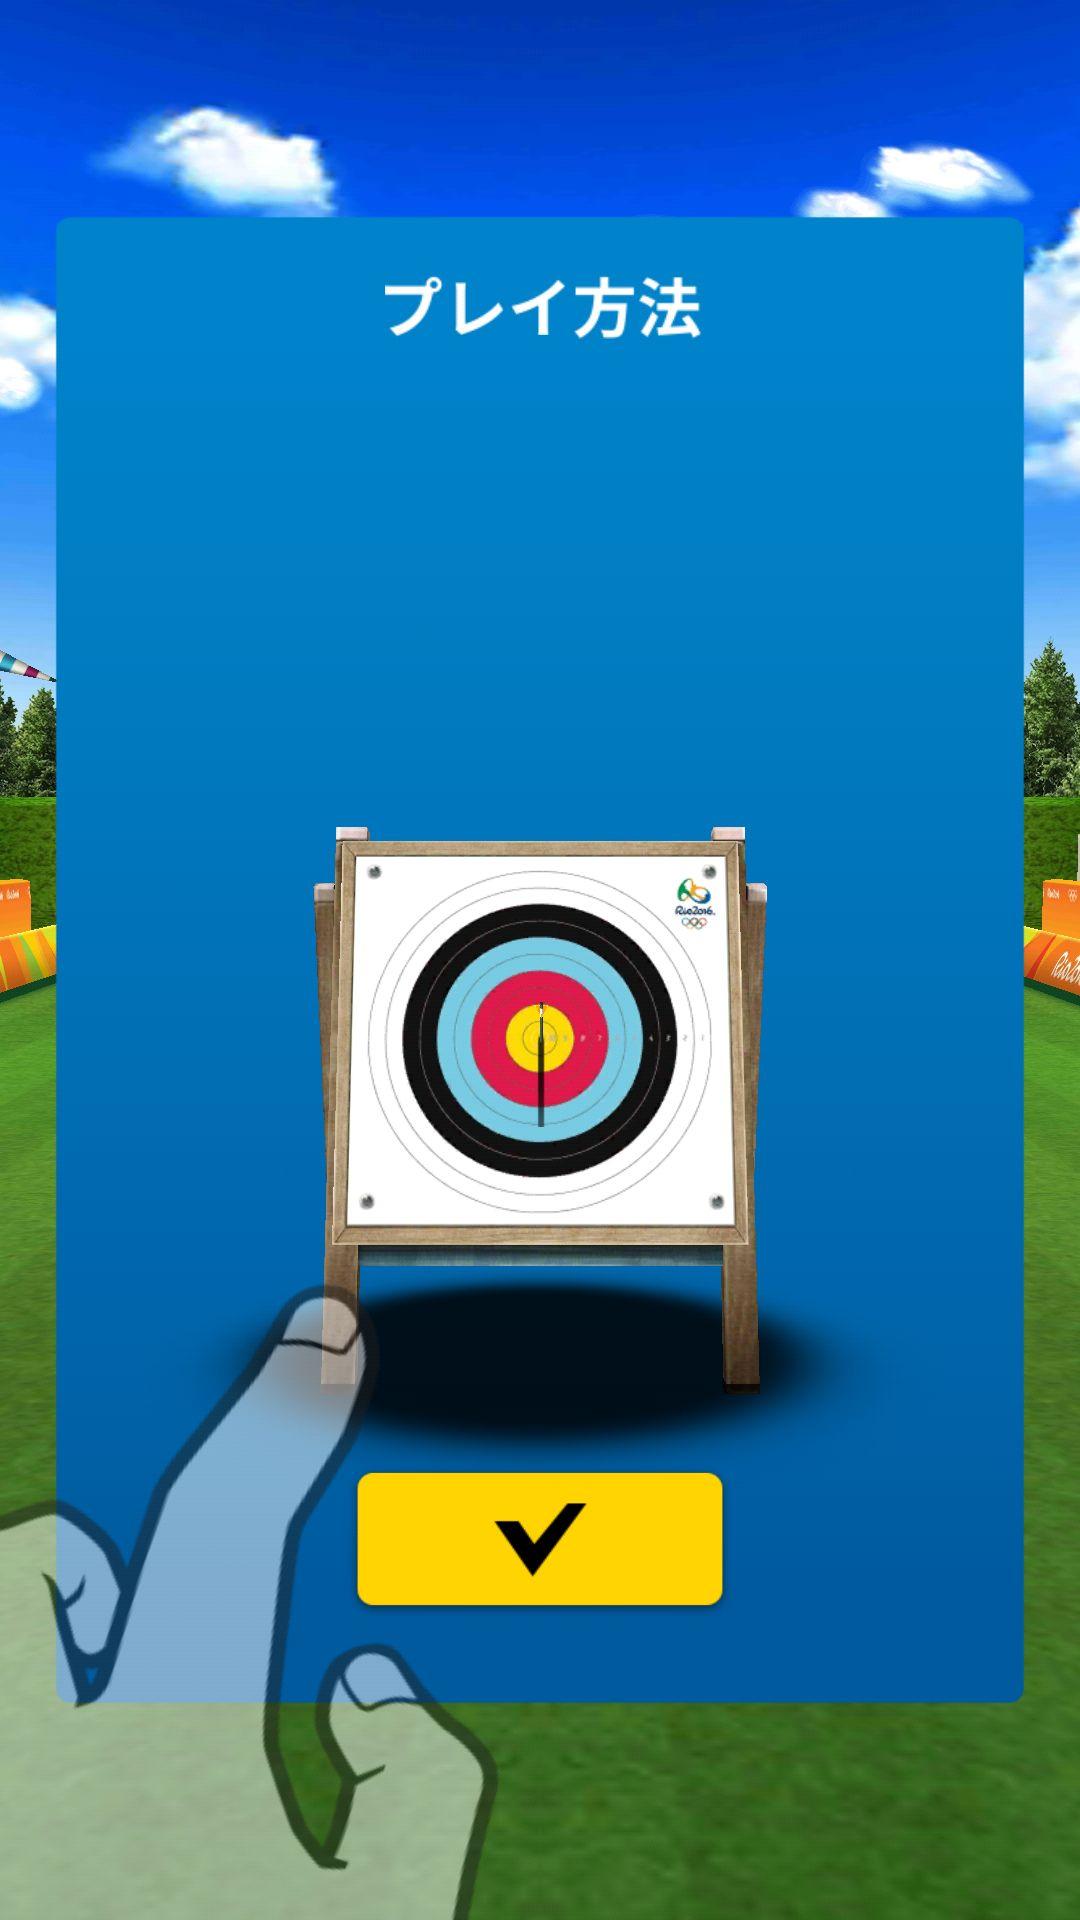 androidアプリ リオ2016オリンピック ゲームズ攻略スクリーンショット2